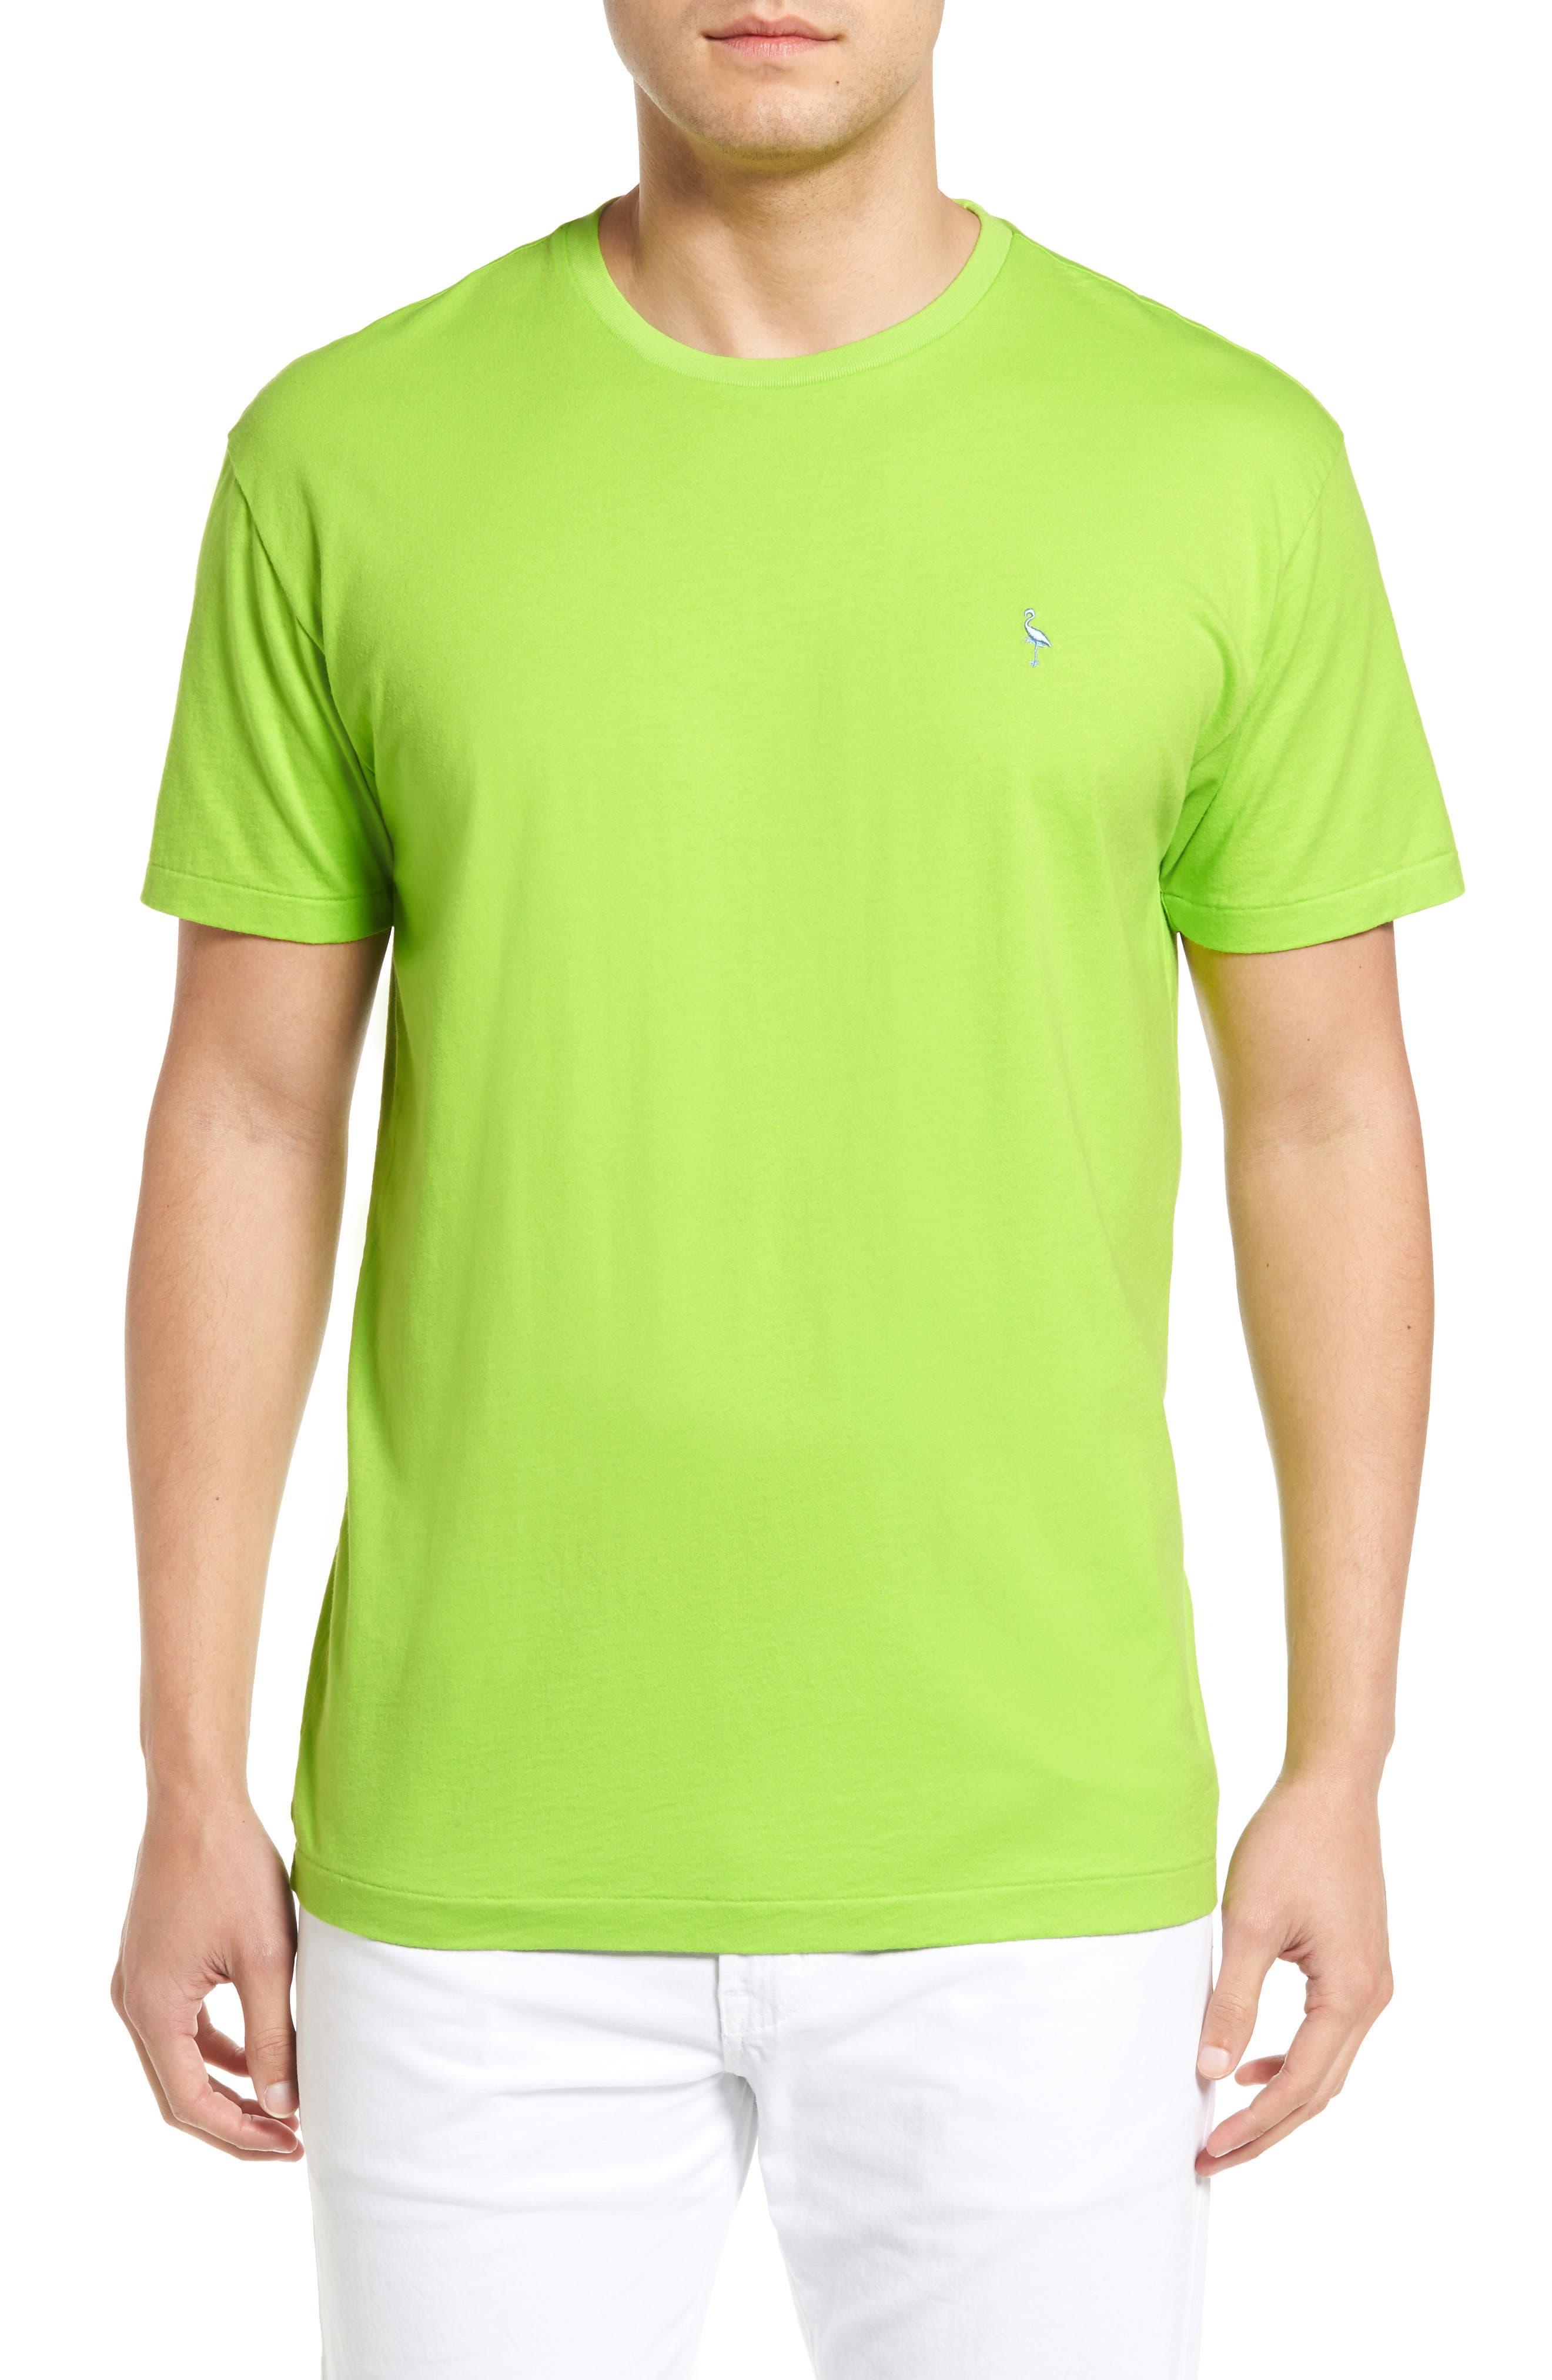 Markham Square T-Shirt,                         Main,                         color, Marathon Green